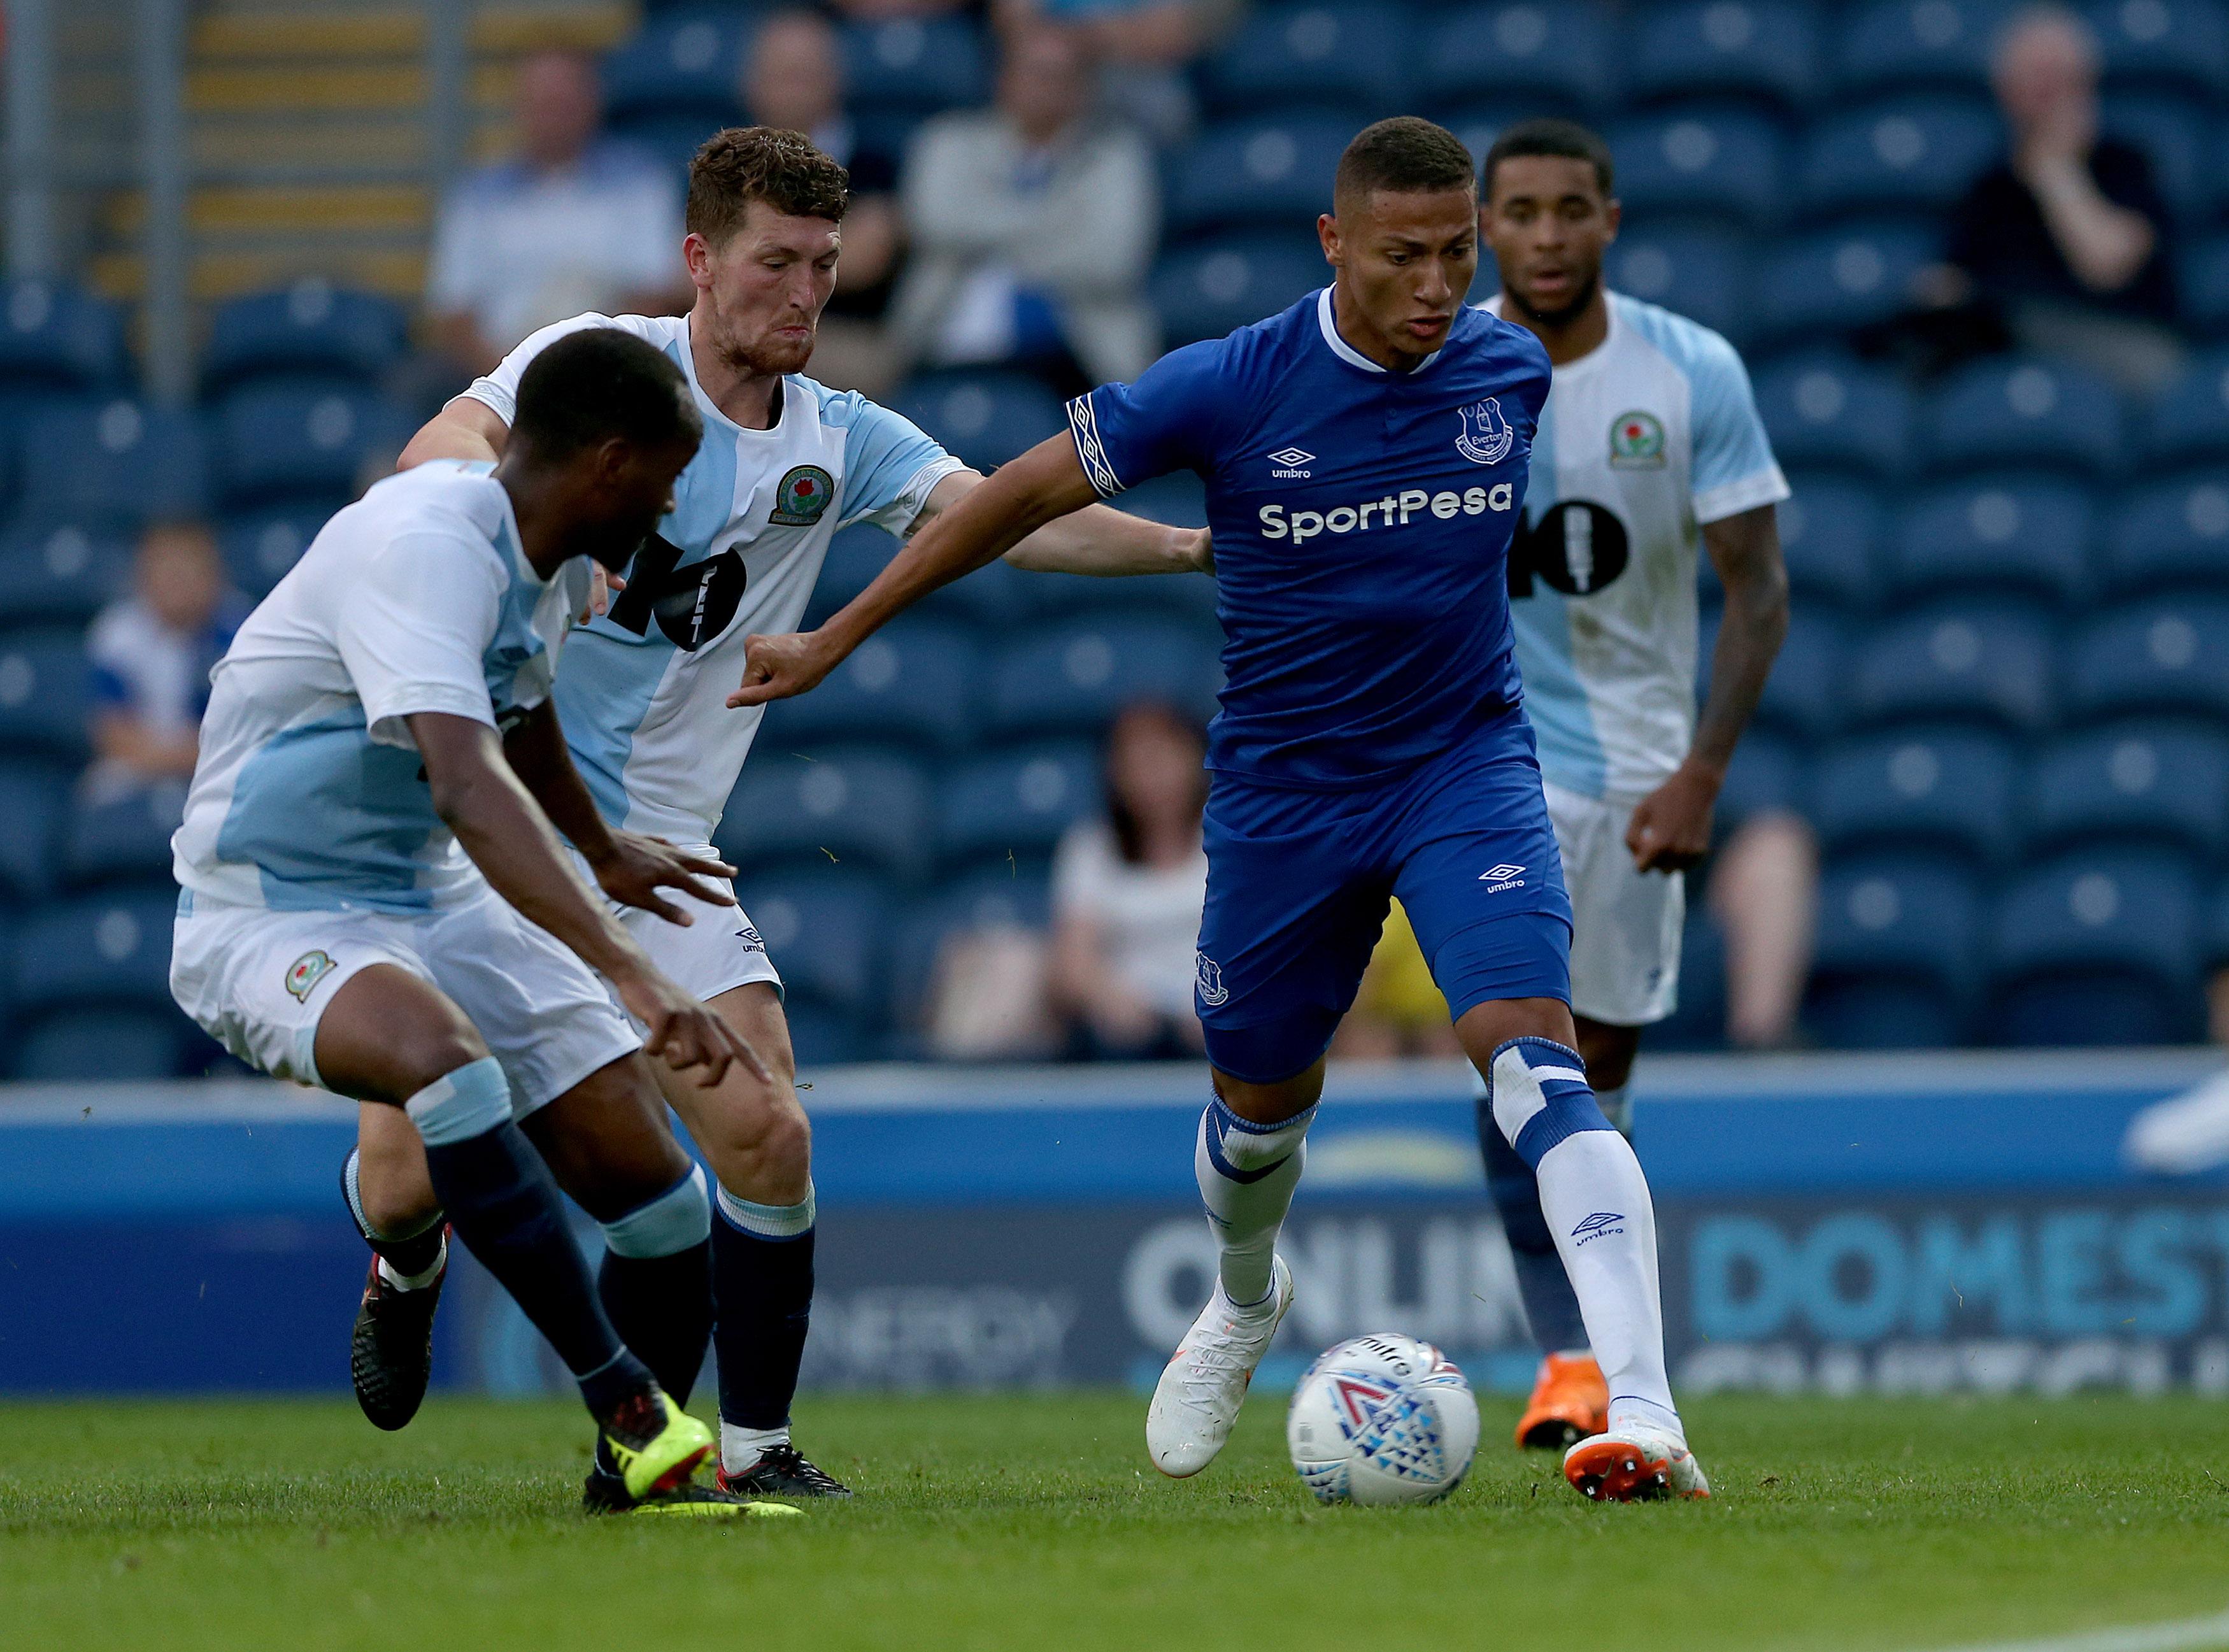 Blackburn Rovers v Everton - Pre-Season Friendly